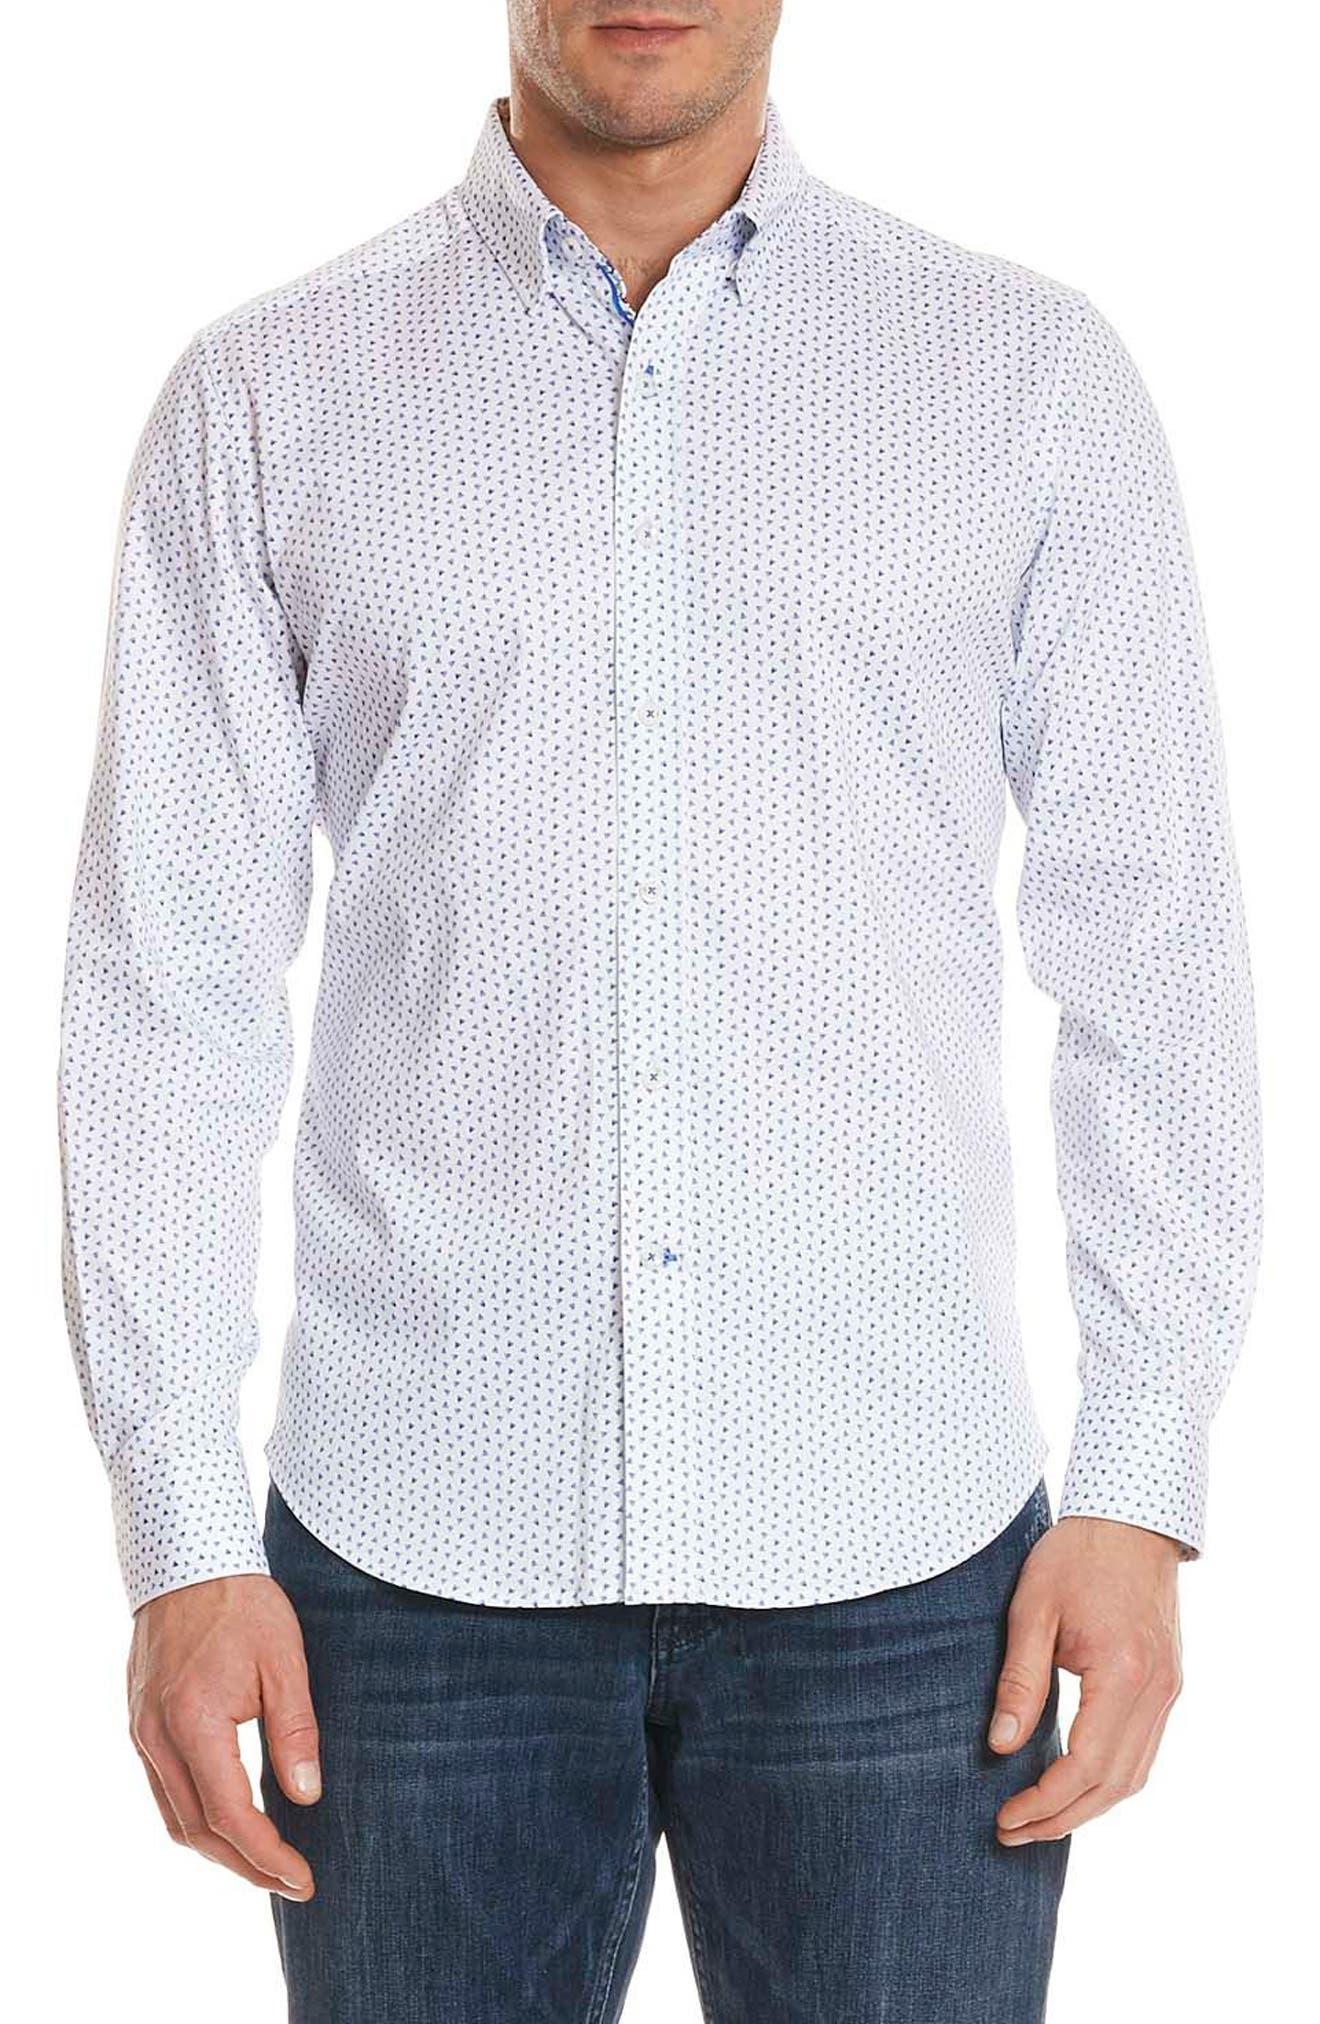 Mitchel Tailored Fit Sport Shirt,                             Main thumbnail 1, color,                             Blue